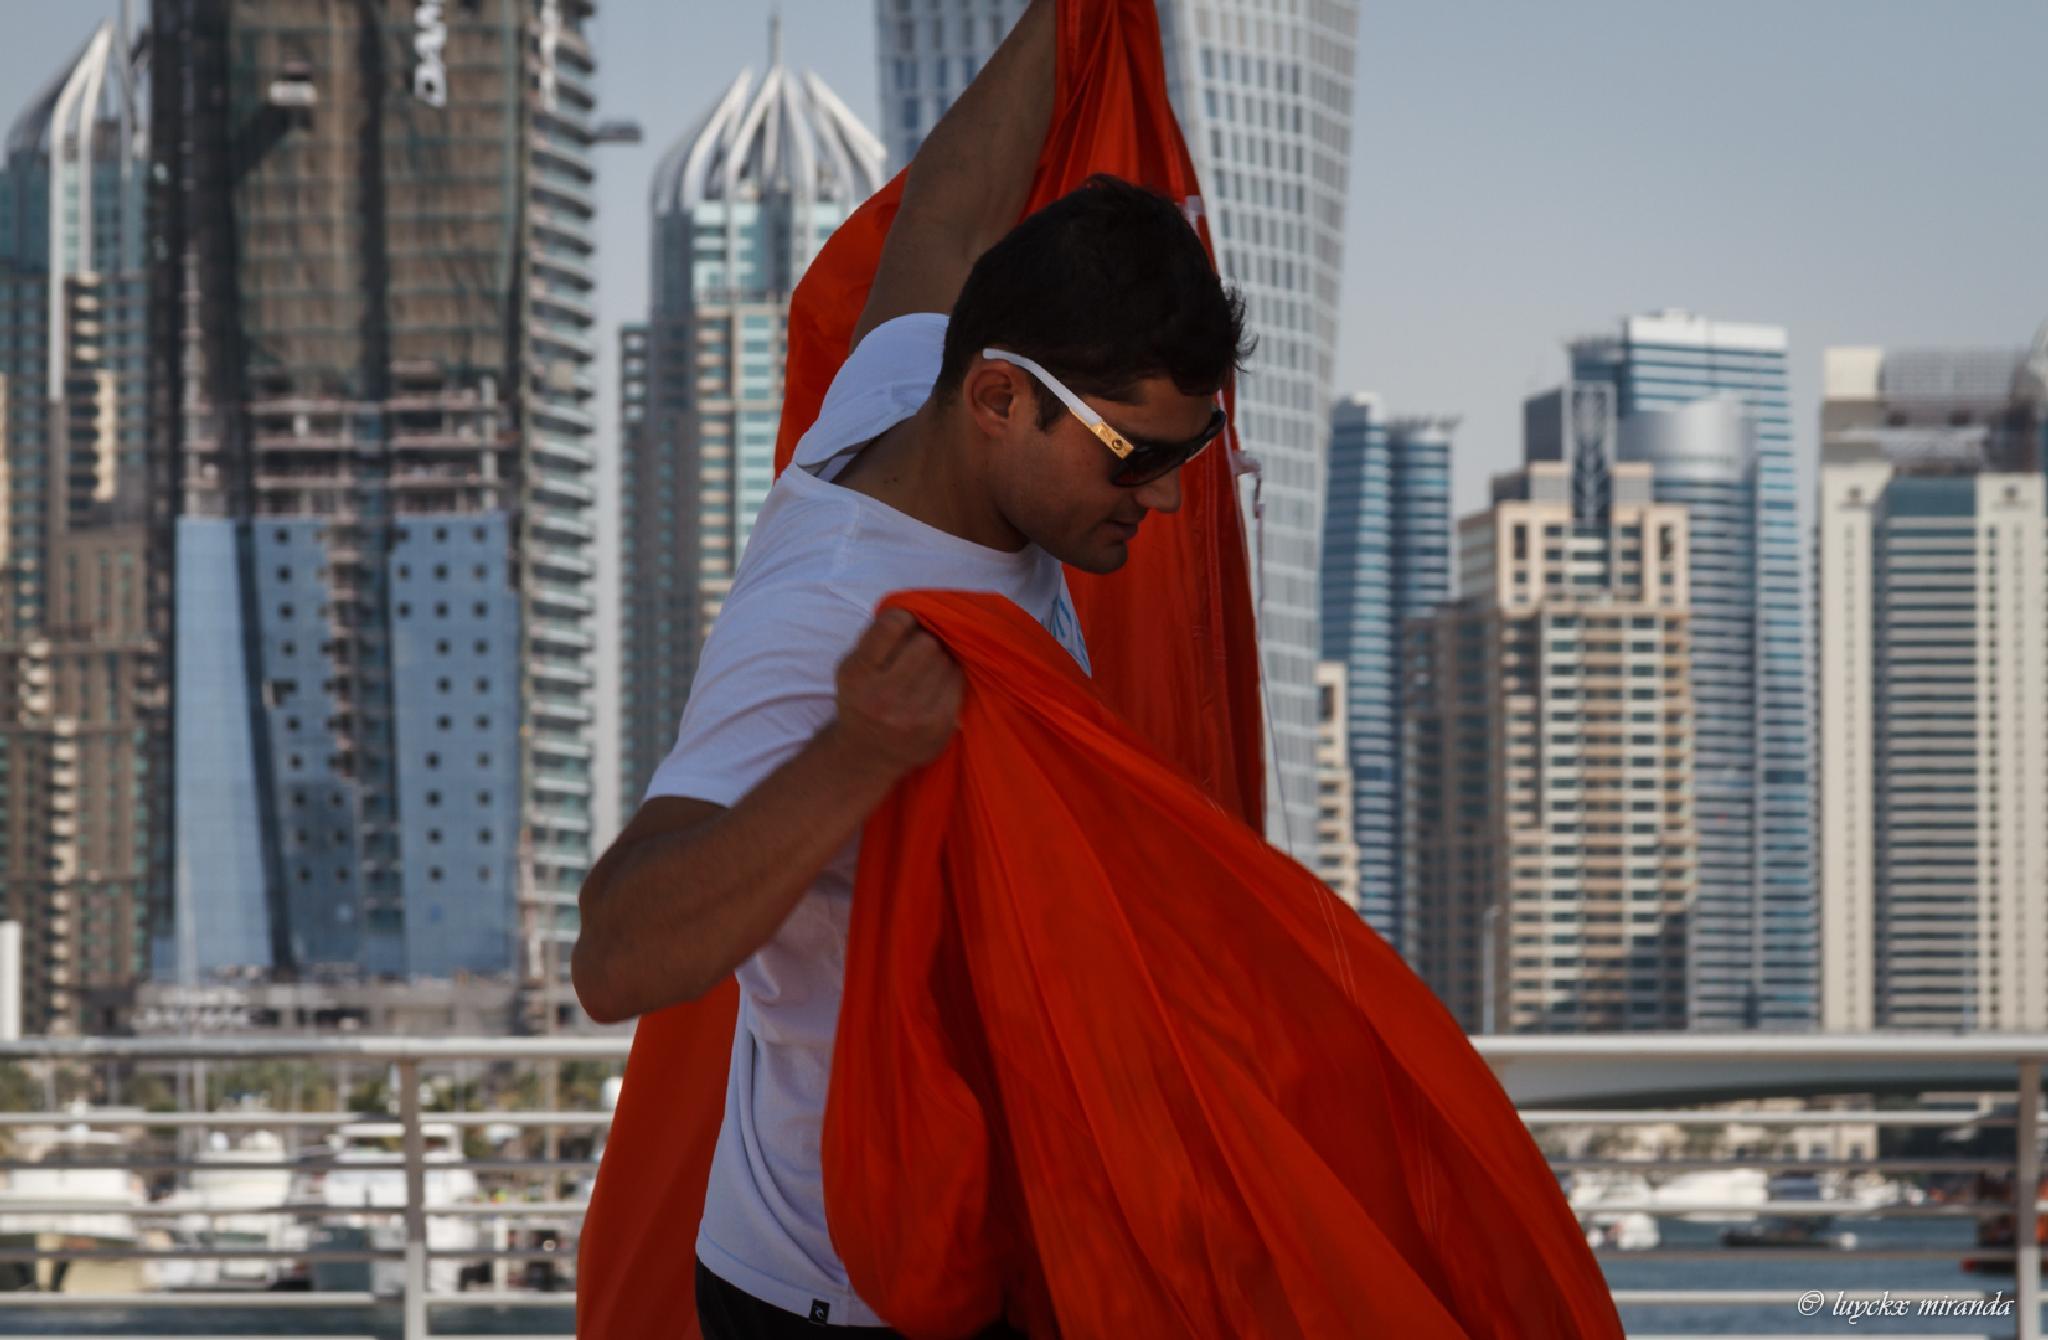 Sky dive Dubai by luyckxmiranda1